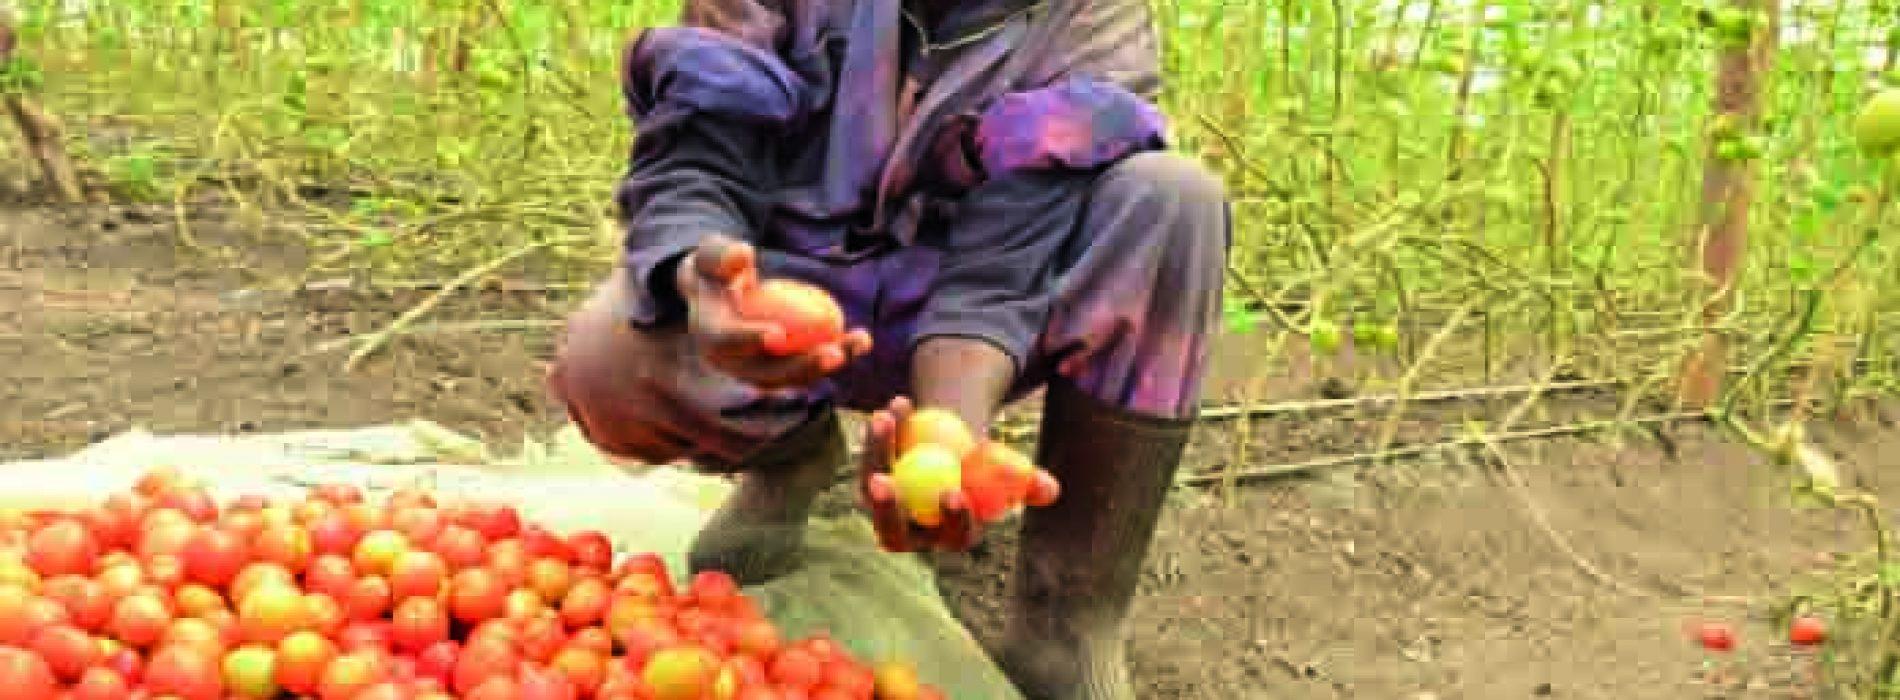 Ministry bans fresh produce imports